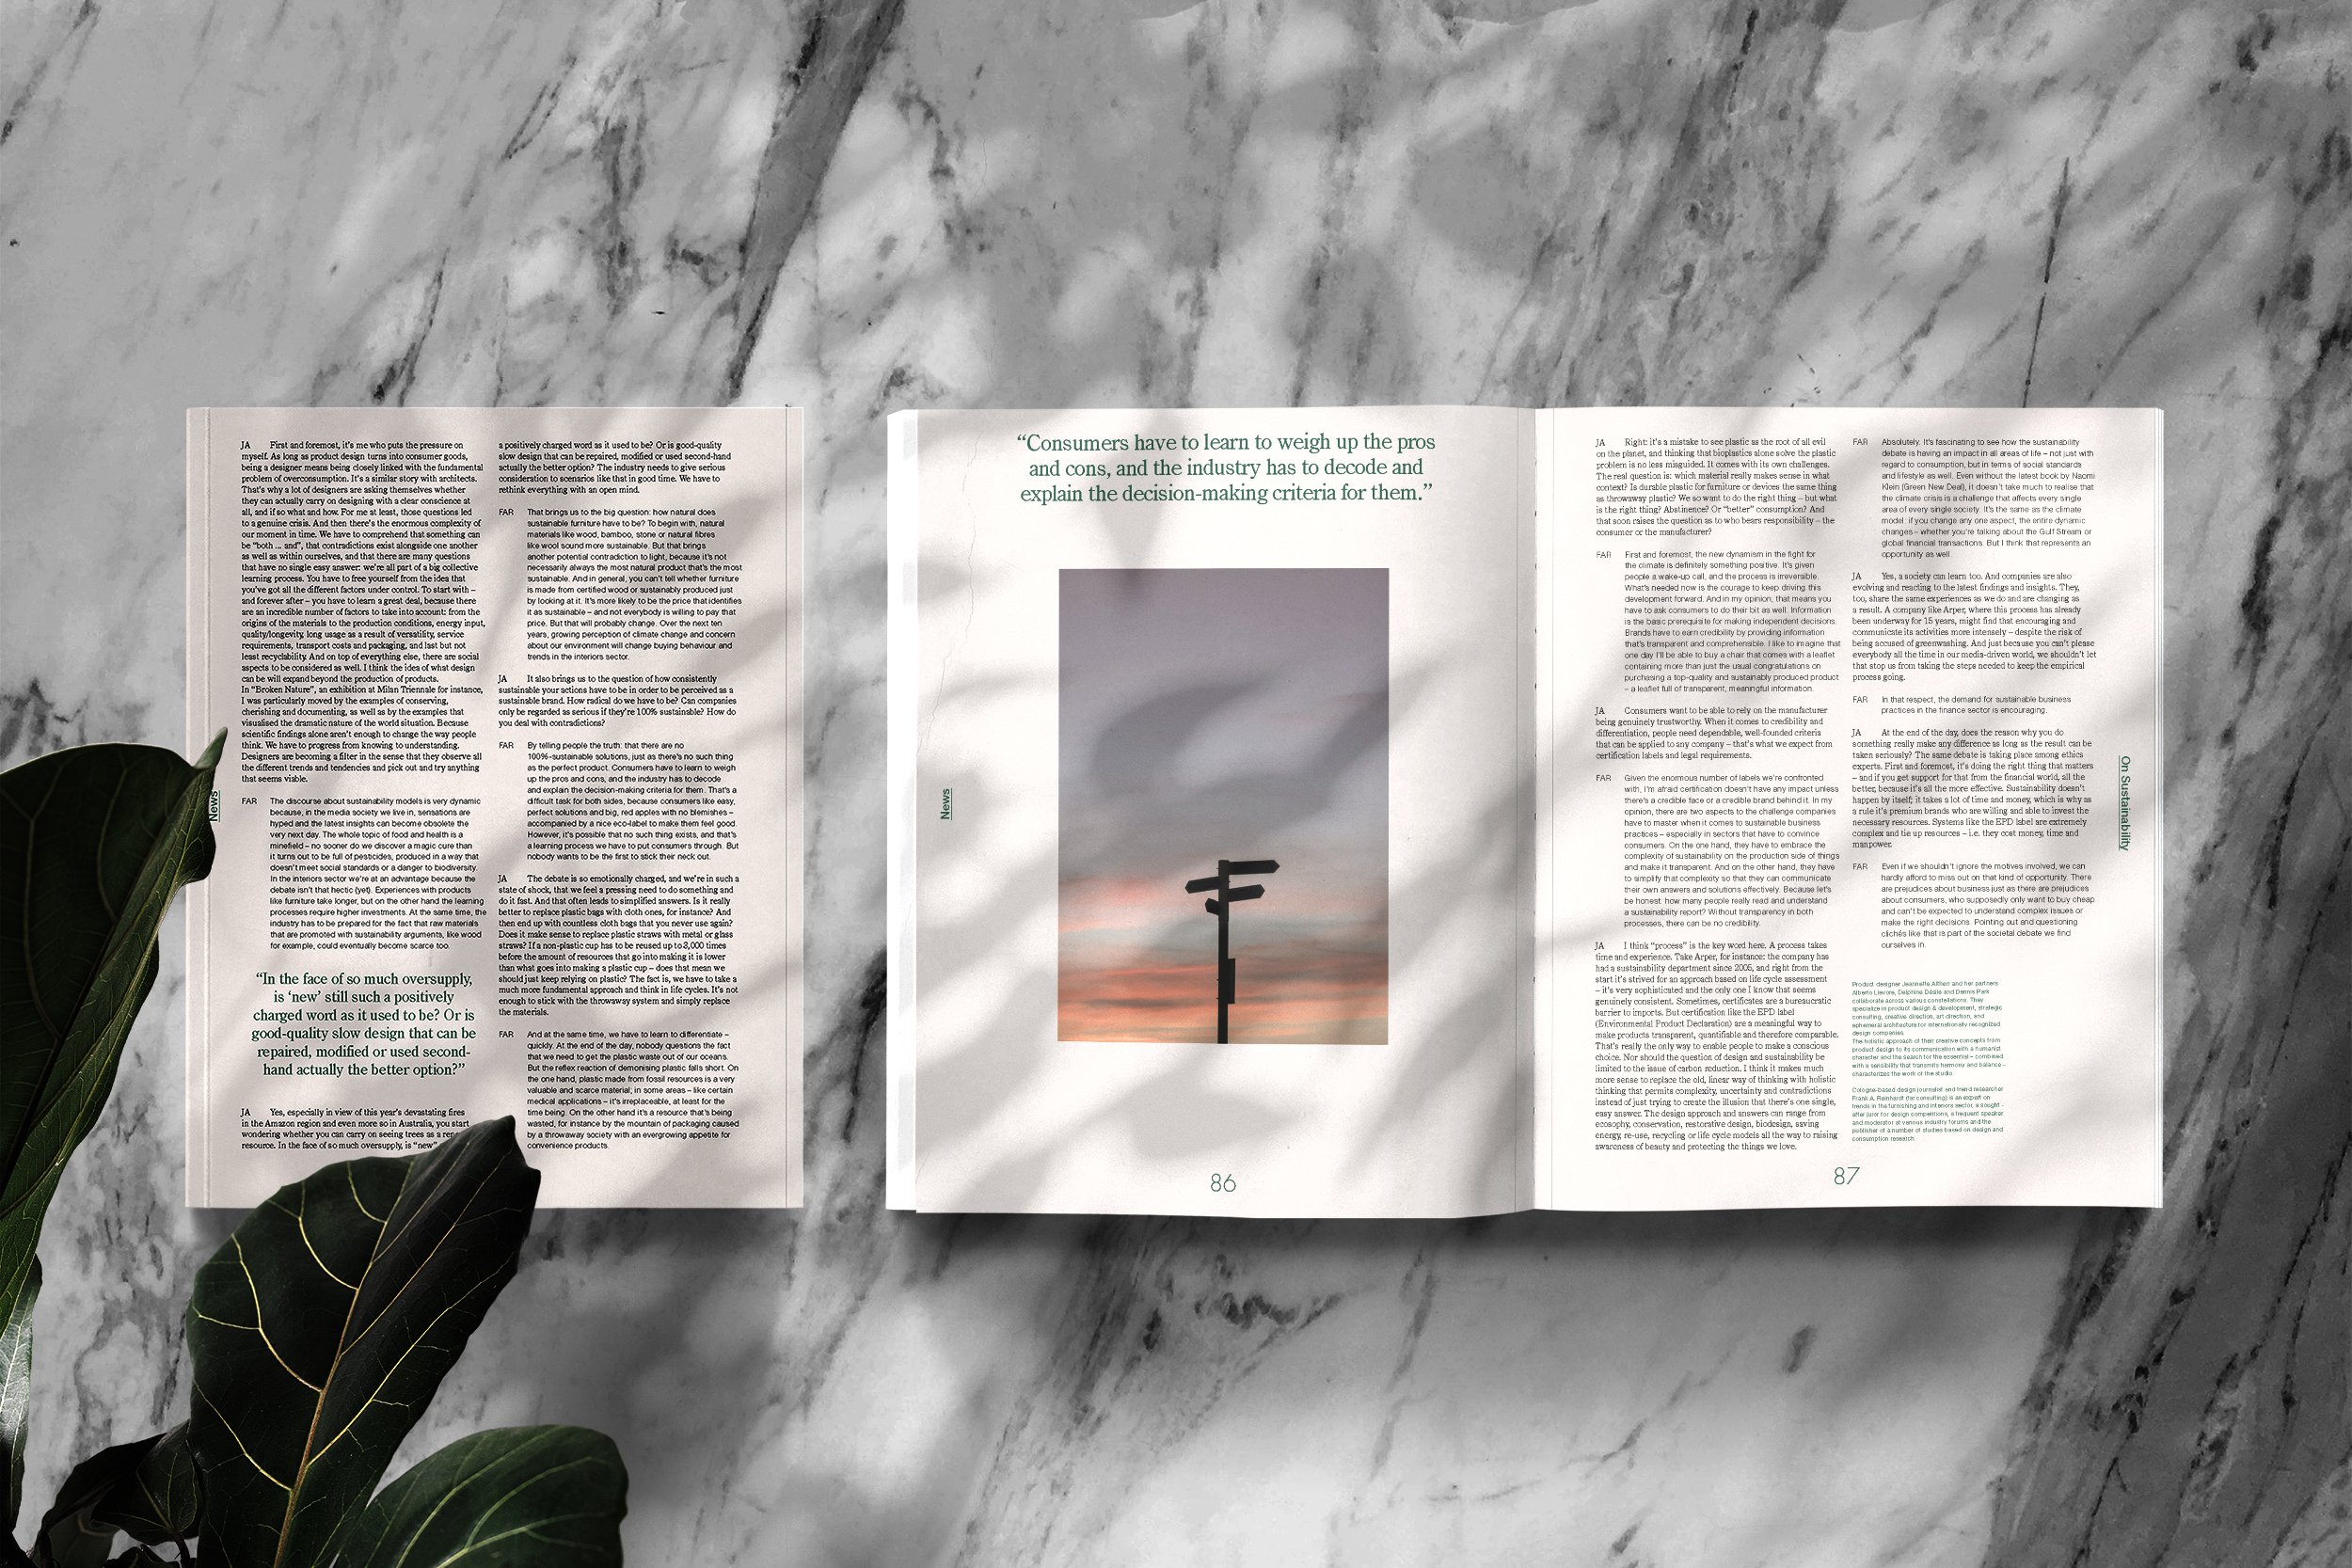 https://farconsulting.de/wp-content/uploads/2020/08/Arper_Interview_Frank-Reinhardt_Neuheiten-Magazin2-1.jpg